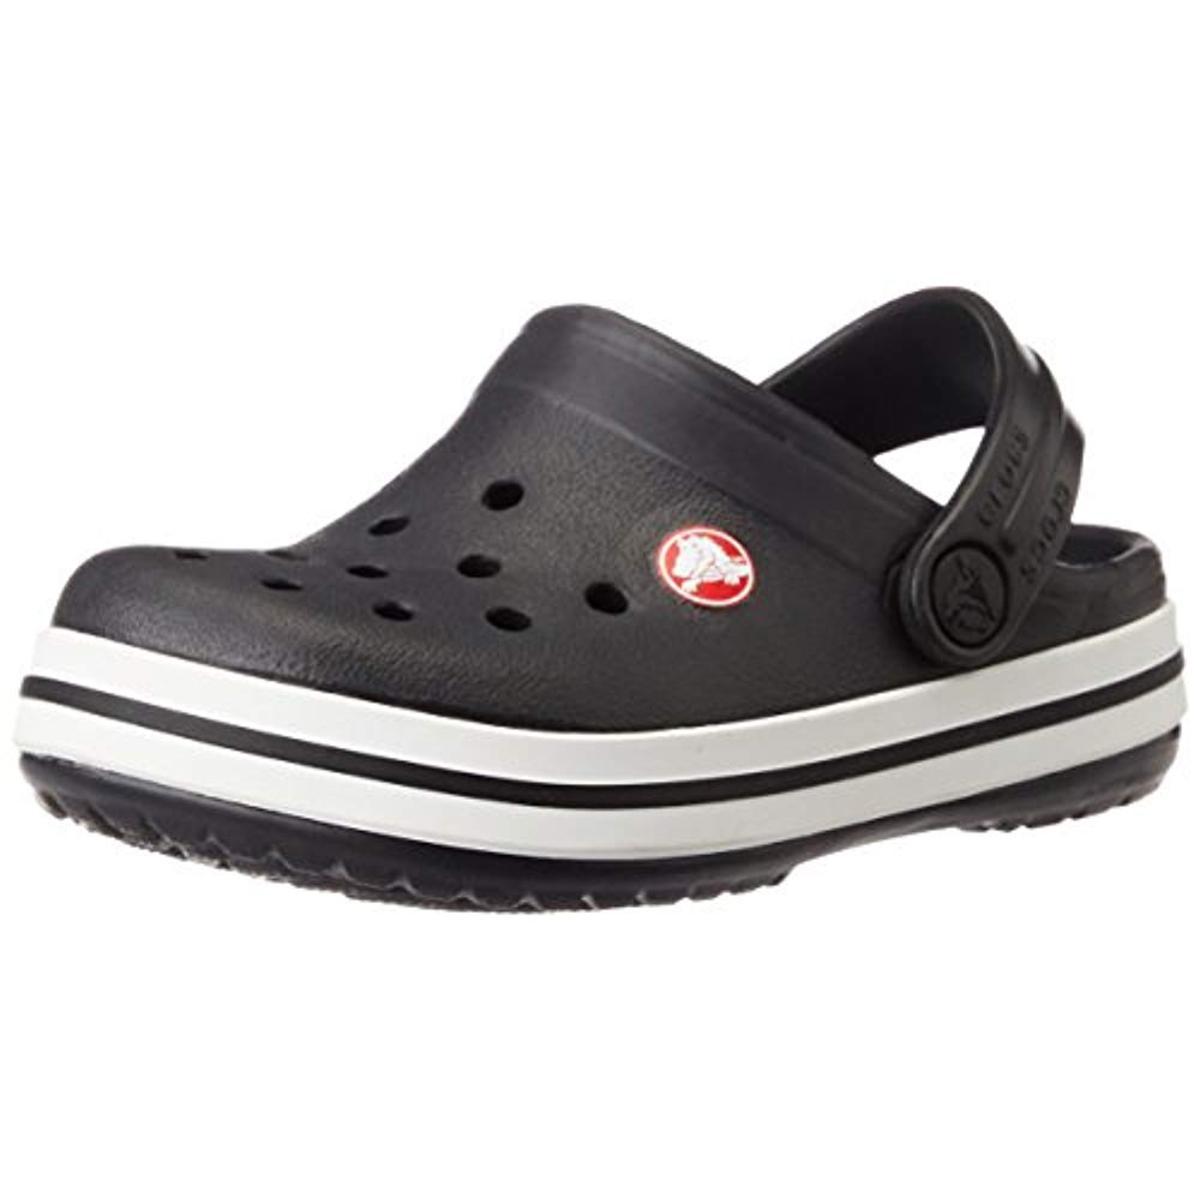 54c78bd9b68f59 Crocs Kids Shoes Unisex (multiple styles   colors)   11.99 AC + Free  Shipping